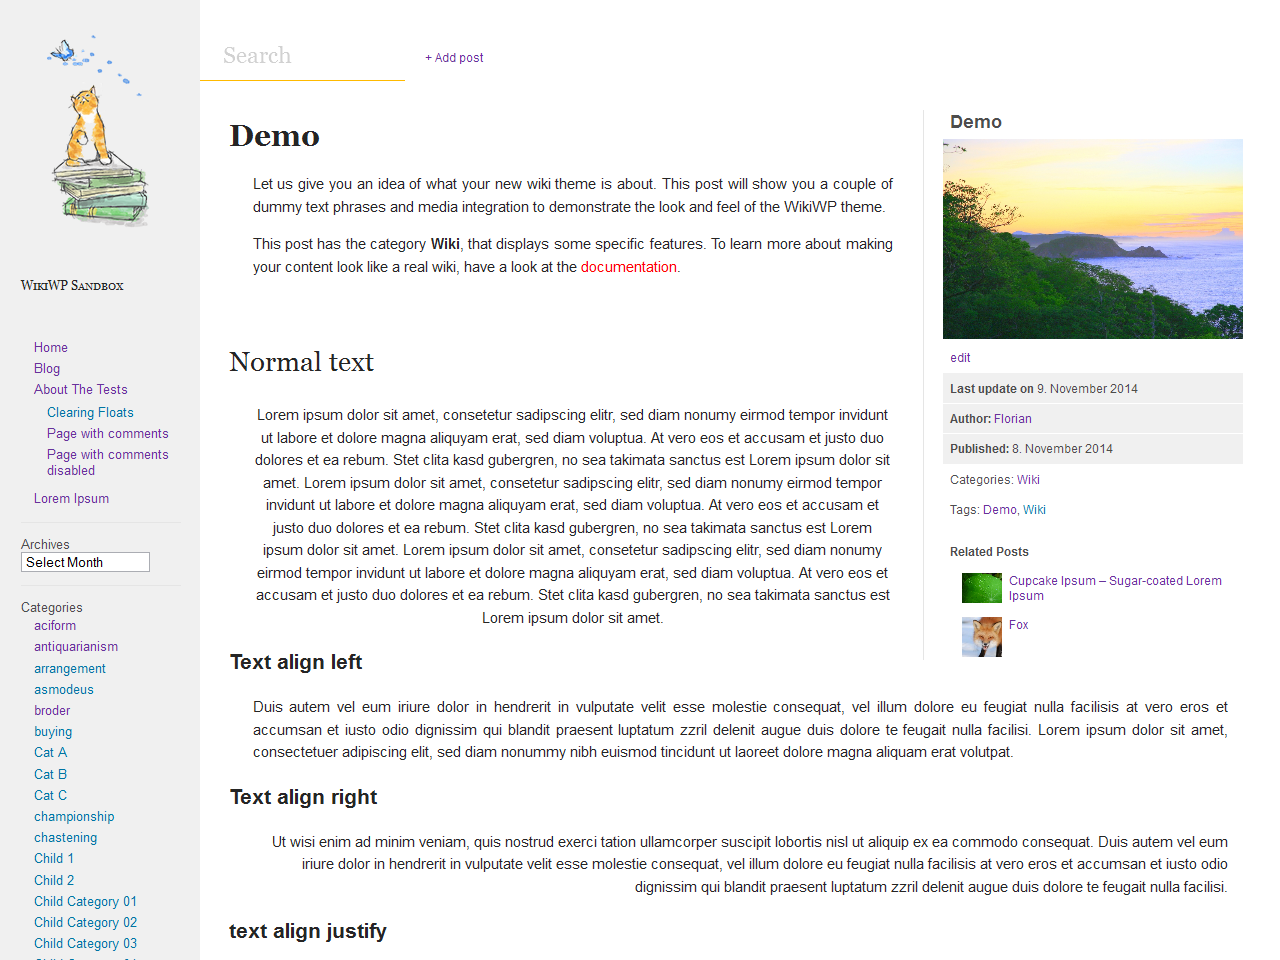 https://themes.svn.wordpress.org/wikiwp/1.4.7/screenshot.png